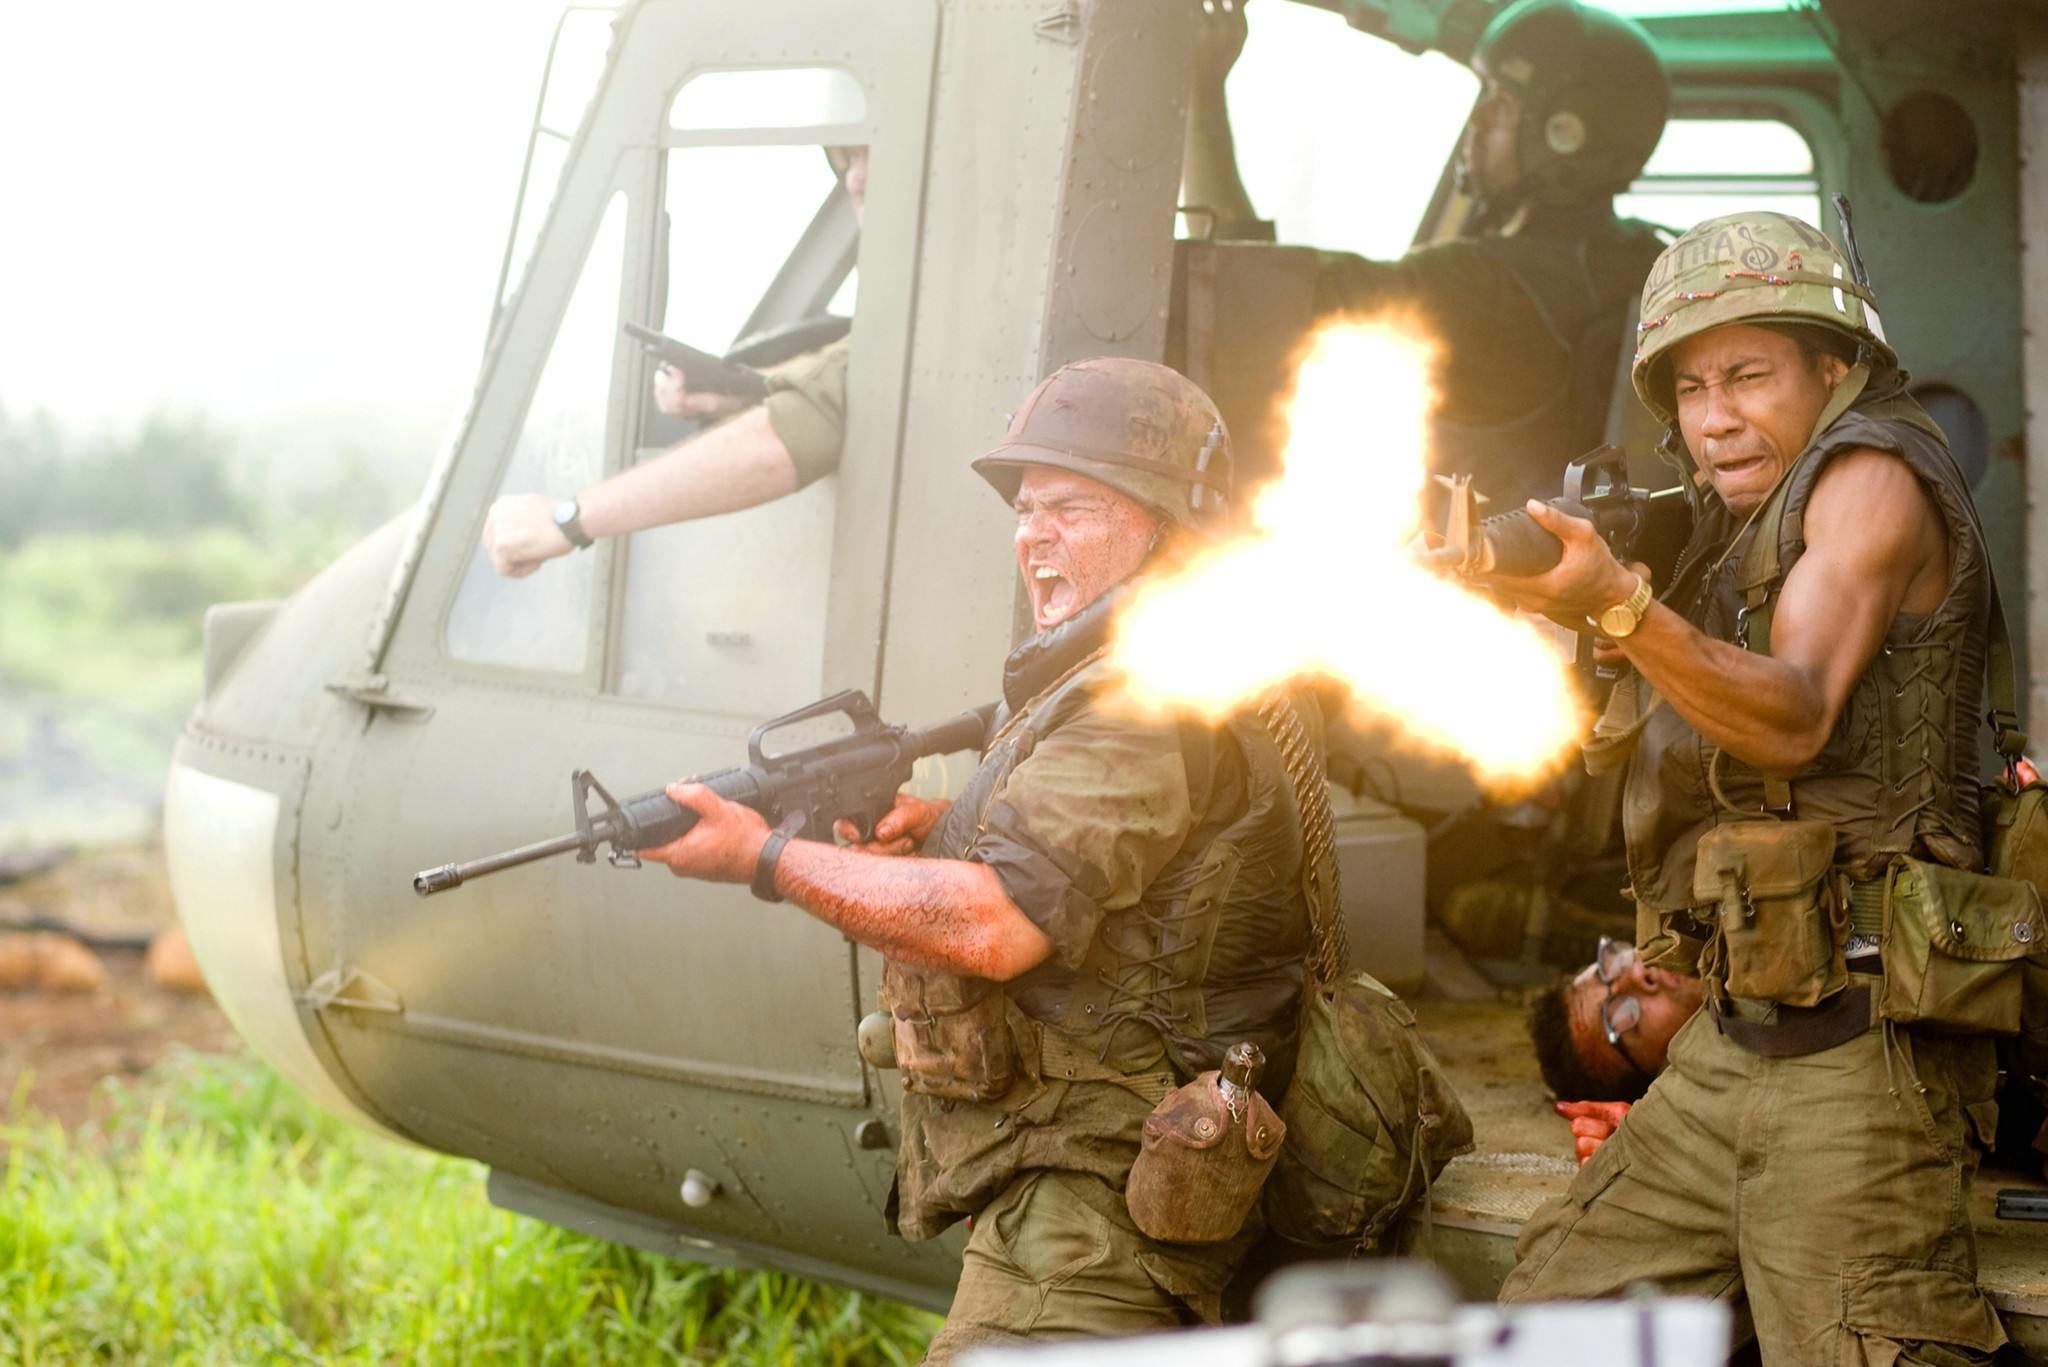 Jack Black and Brandon T. Jackson in Tropic Thunder (2008)